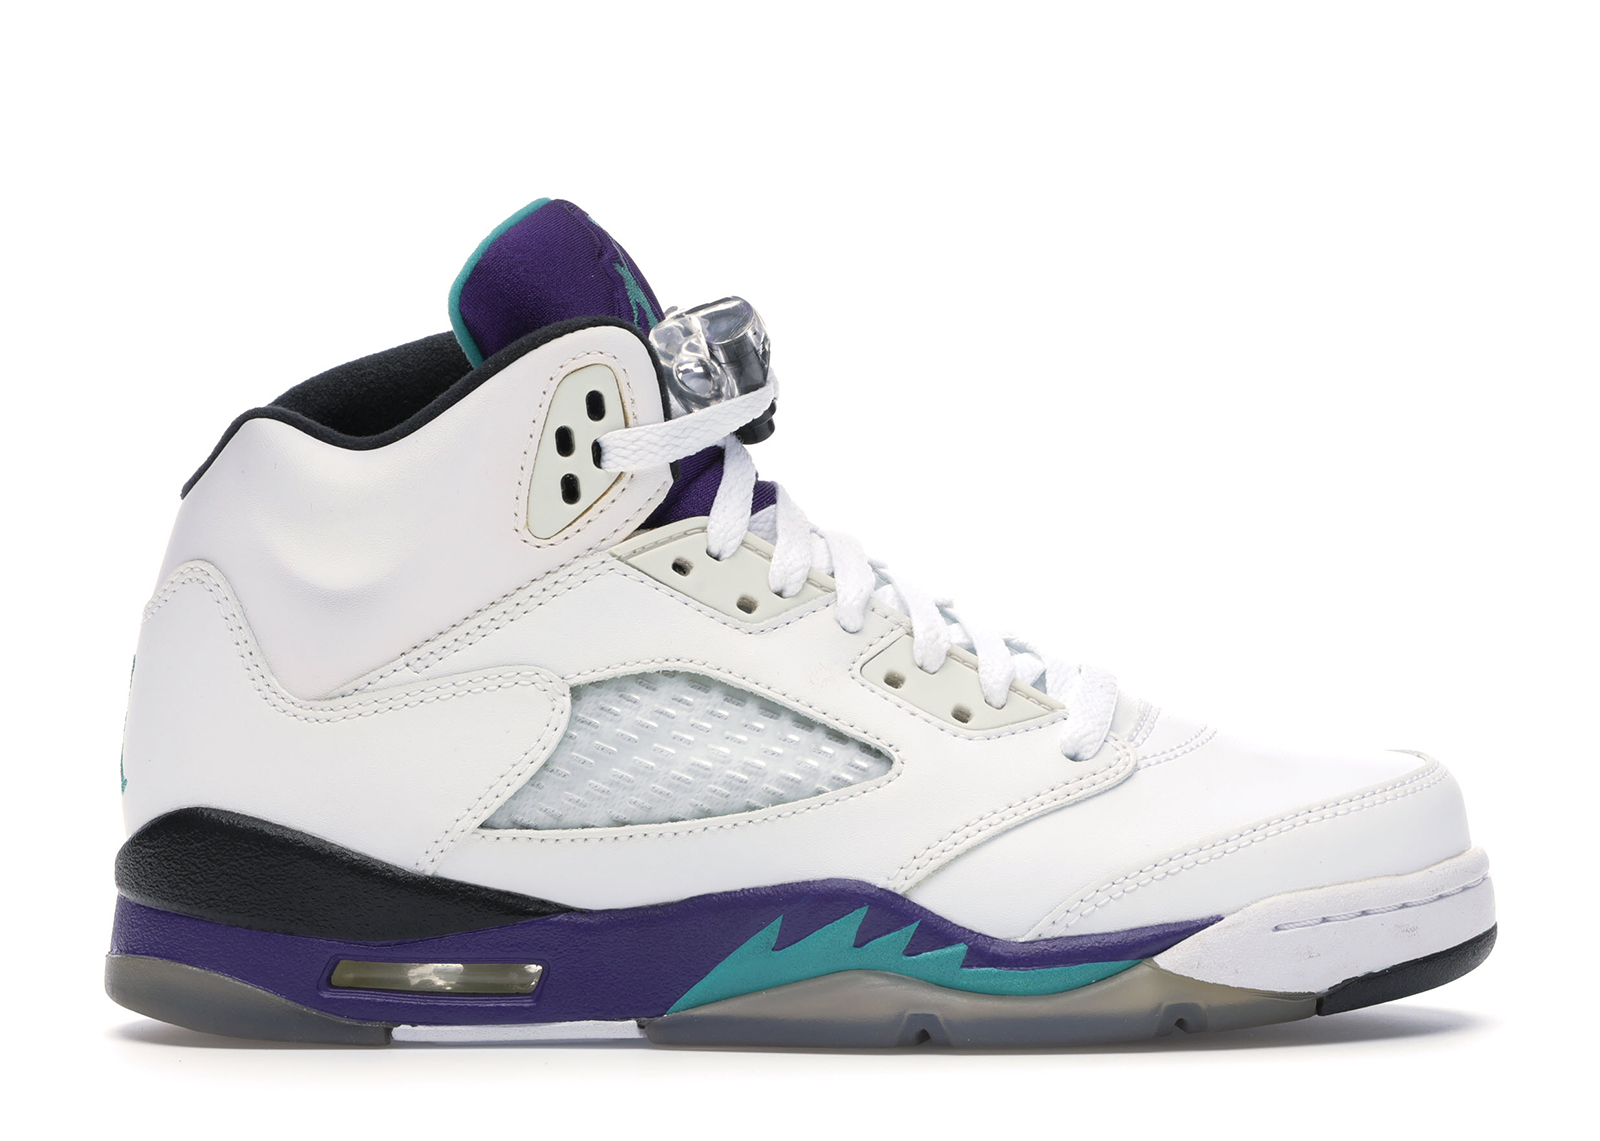 Jordan 5 Retro Grape 2013 (GS) - 440888-108